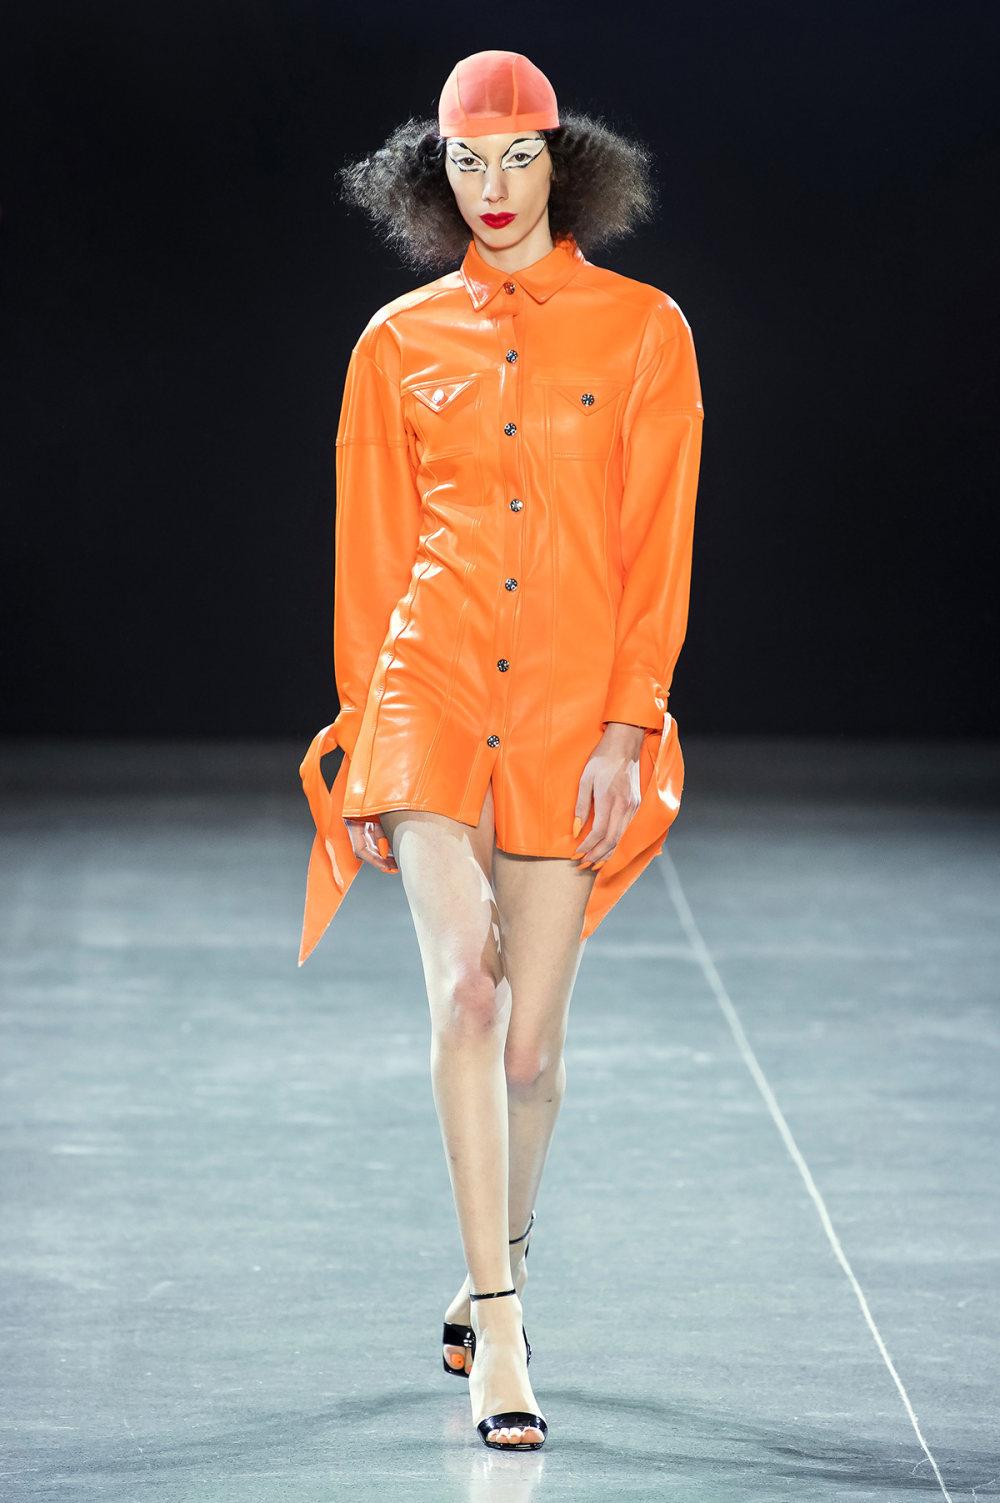 Christian Cowan时装系列虽然巨大的薄纱层状服装并没有那么特别-10.jpg